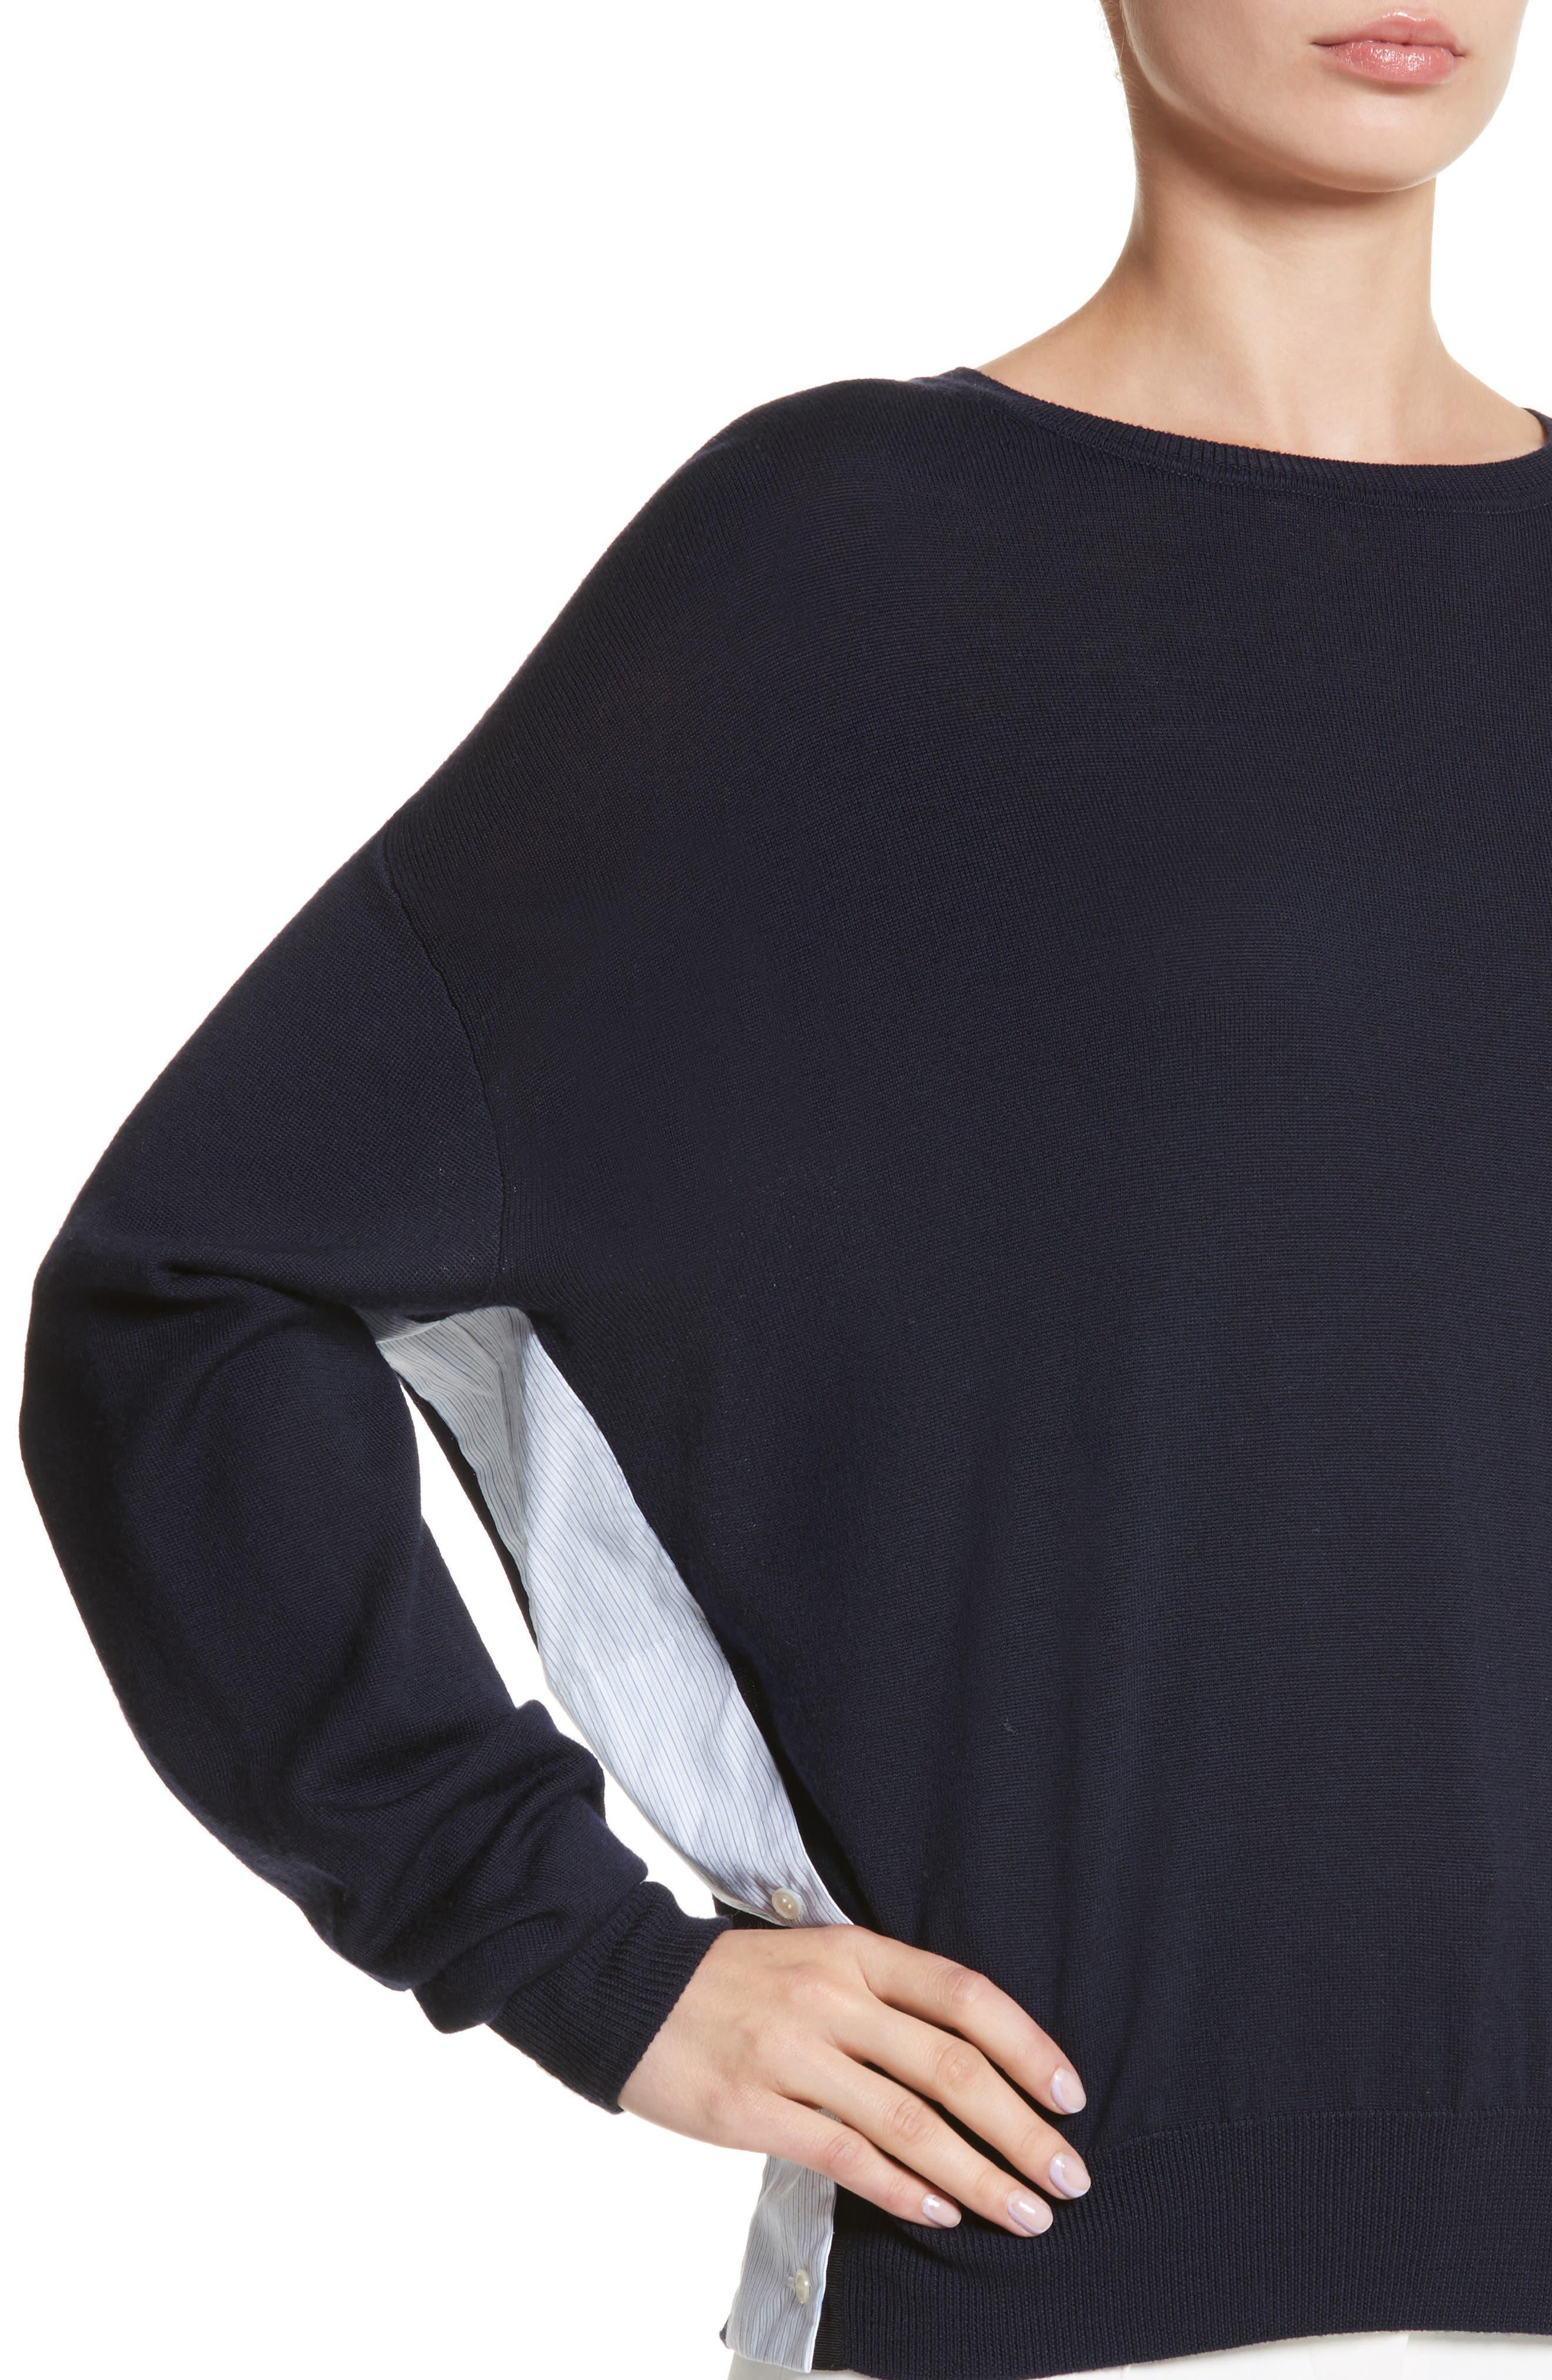 Alternate Image 4  - Adam Lippes Cotton Gusset Merino Wool Sweater